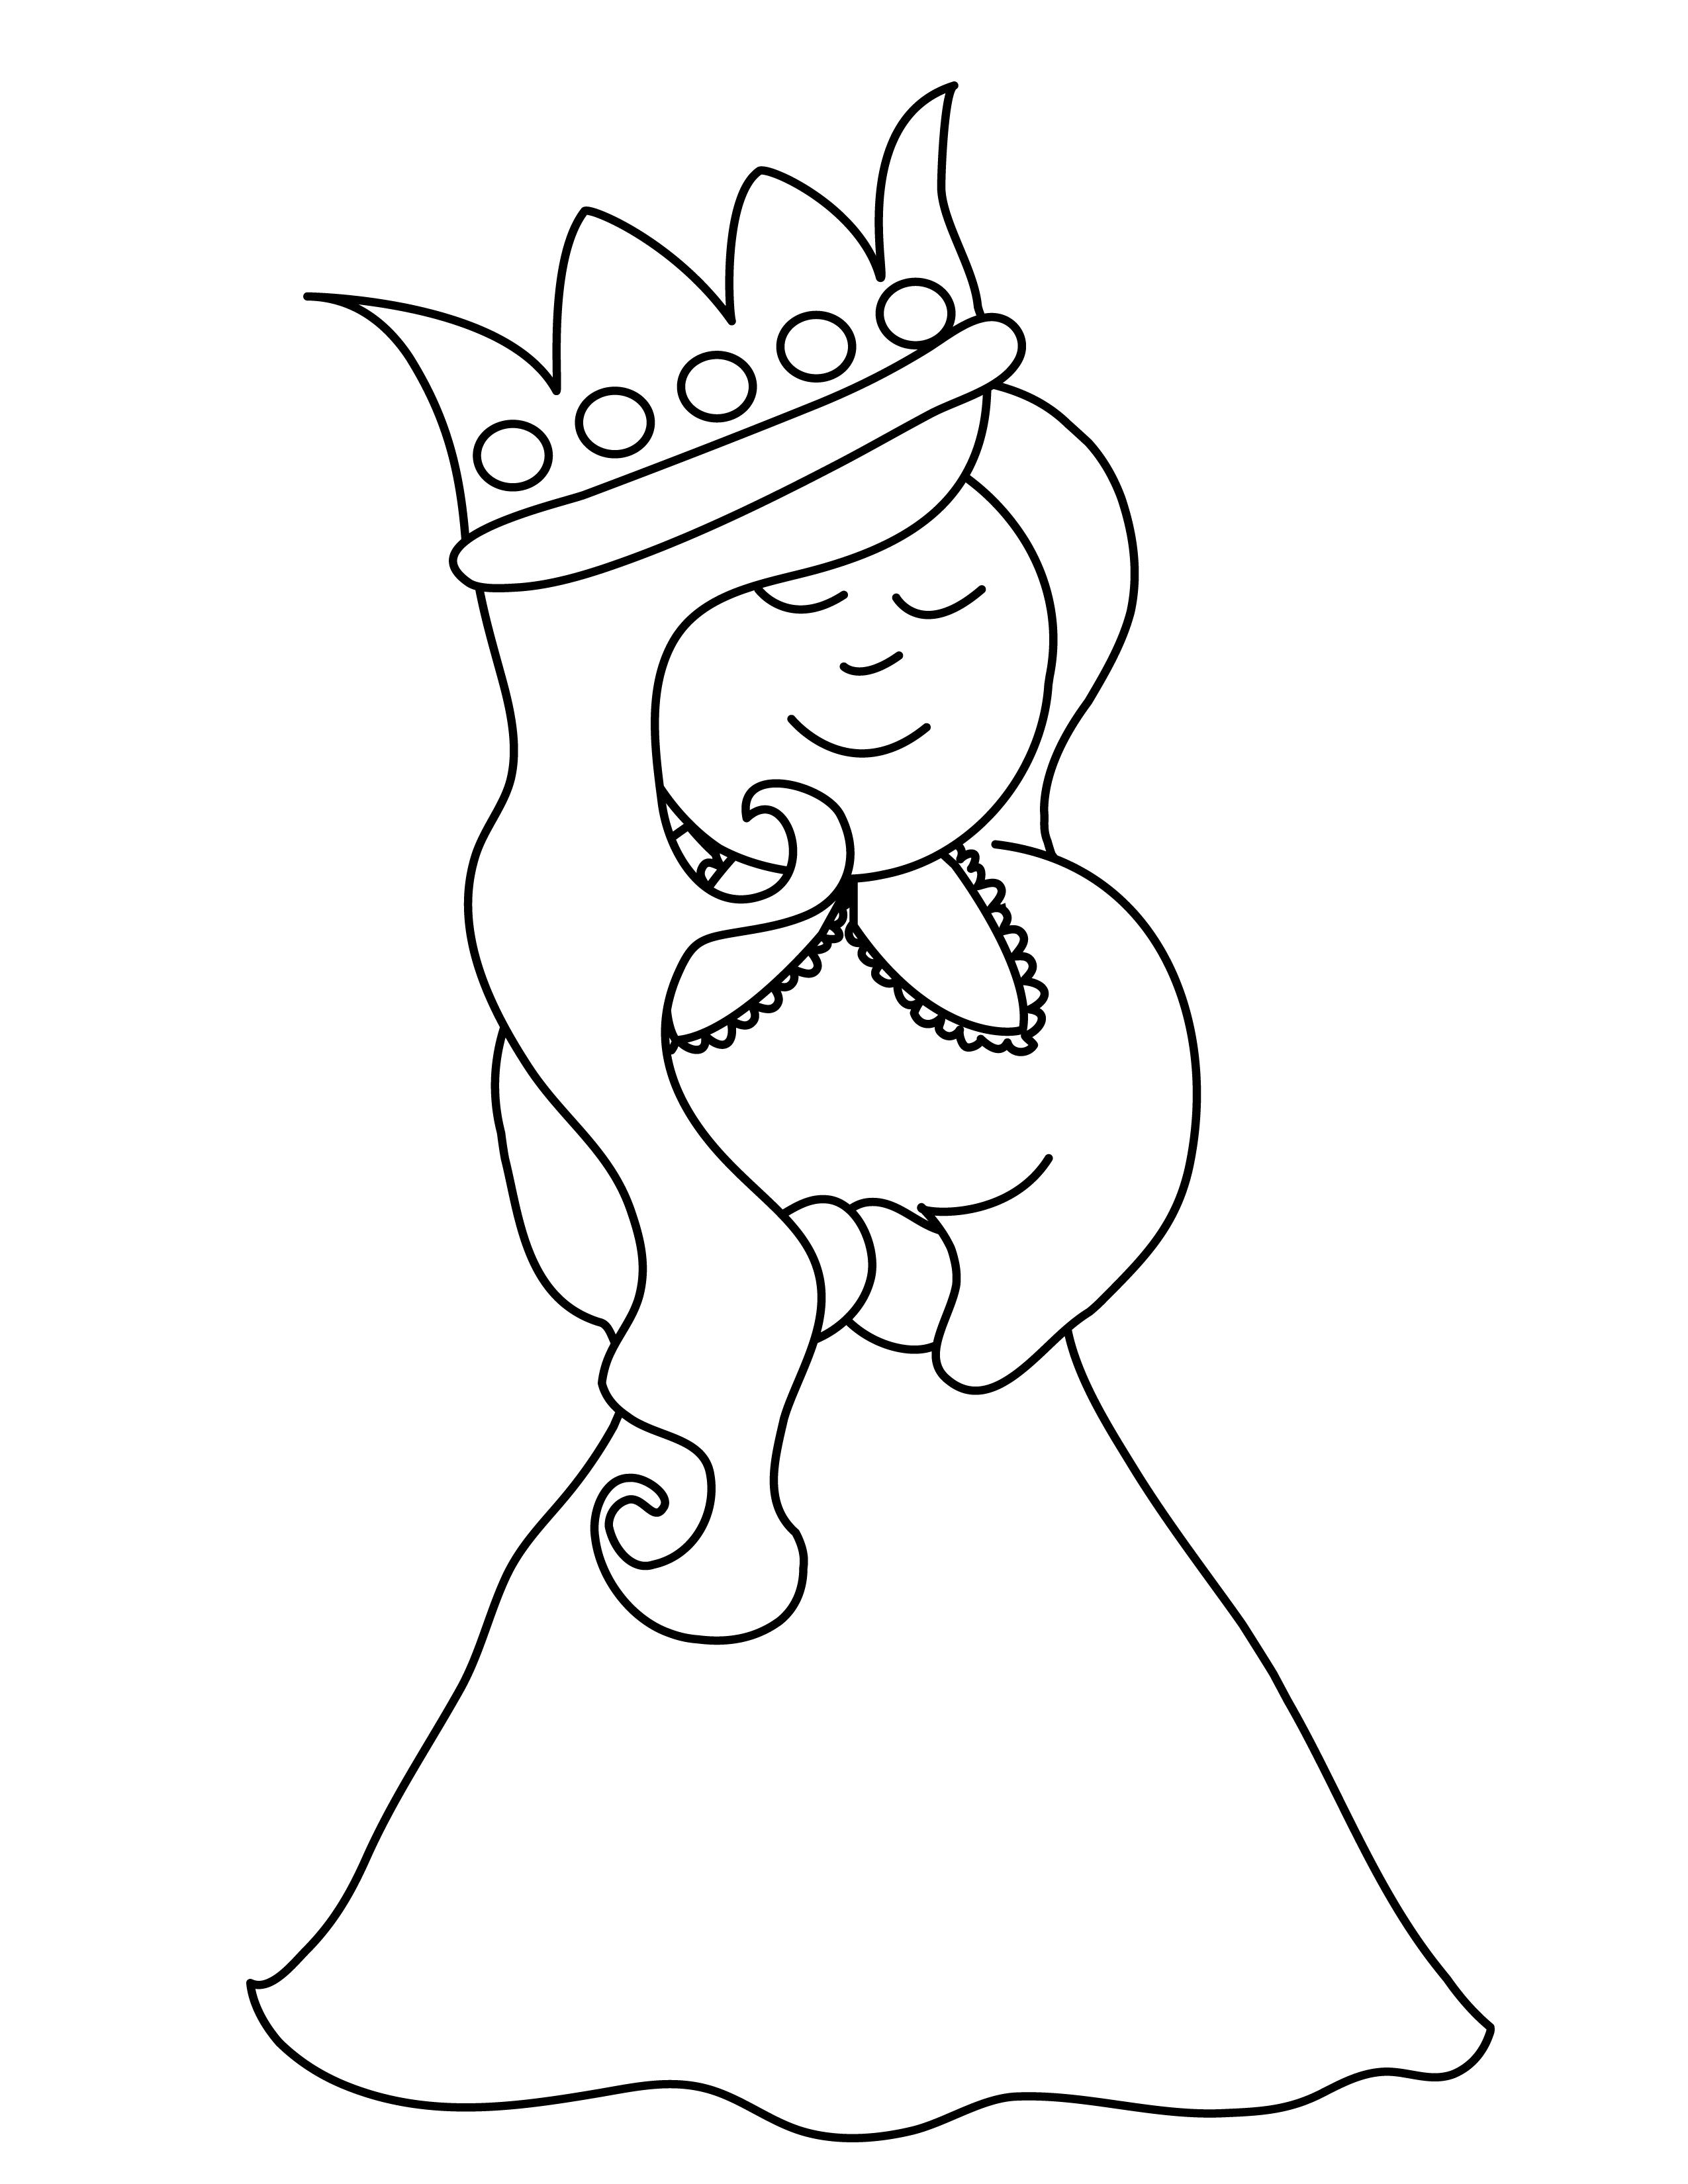 Free Queen Cliparts Black, Download Free Clip Art, Free Clip.